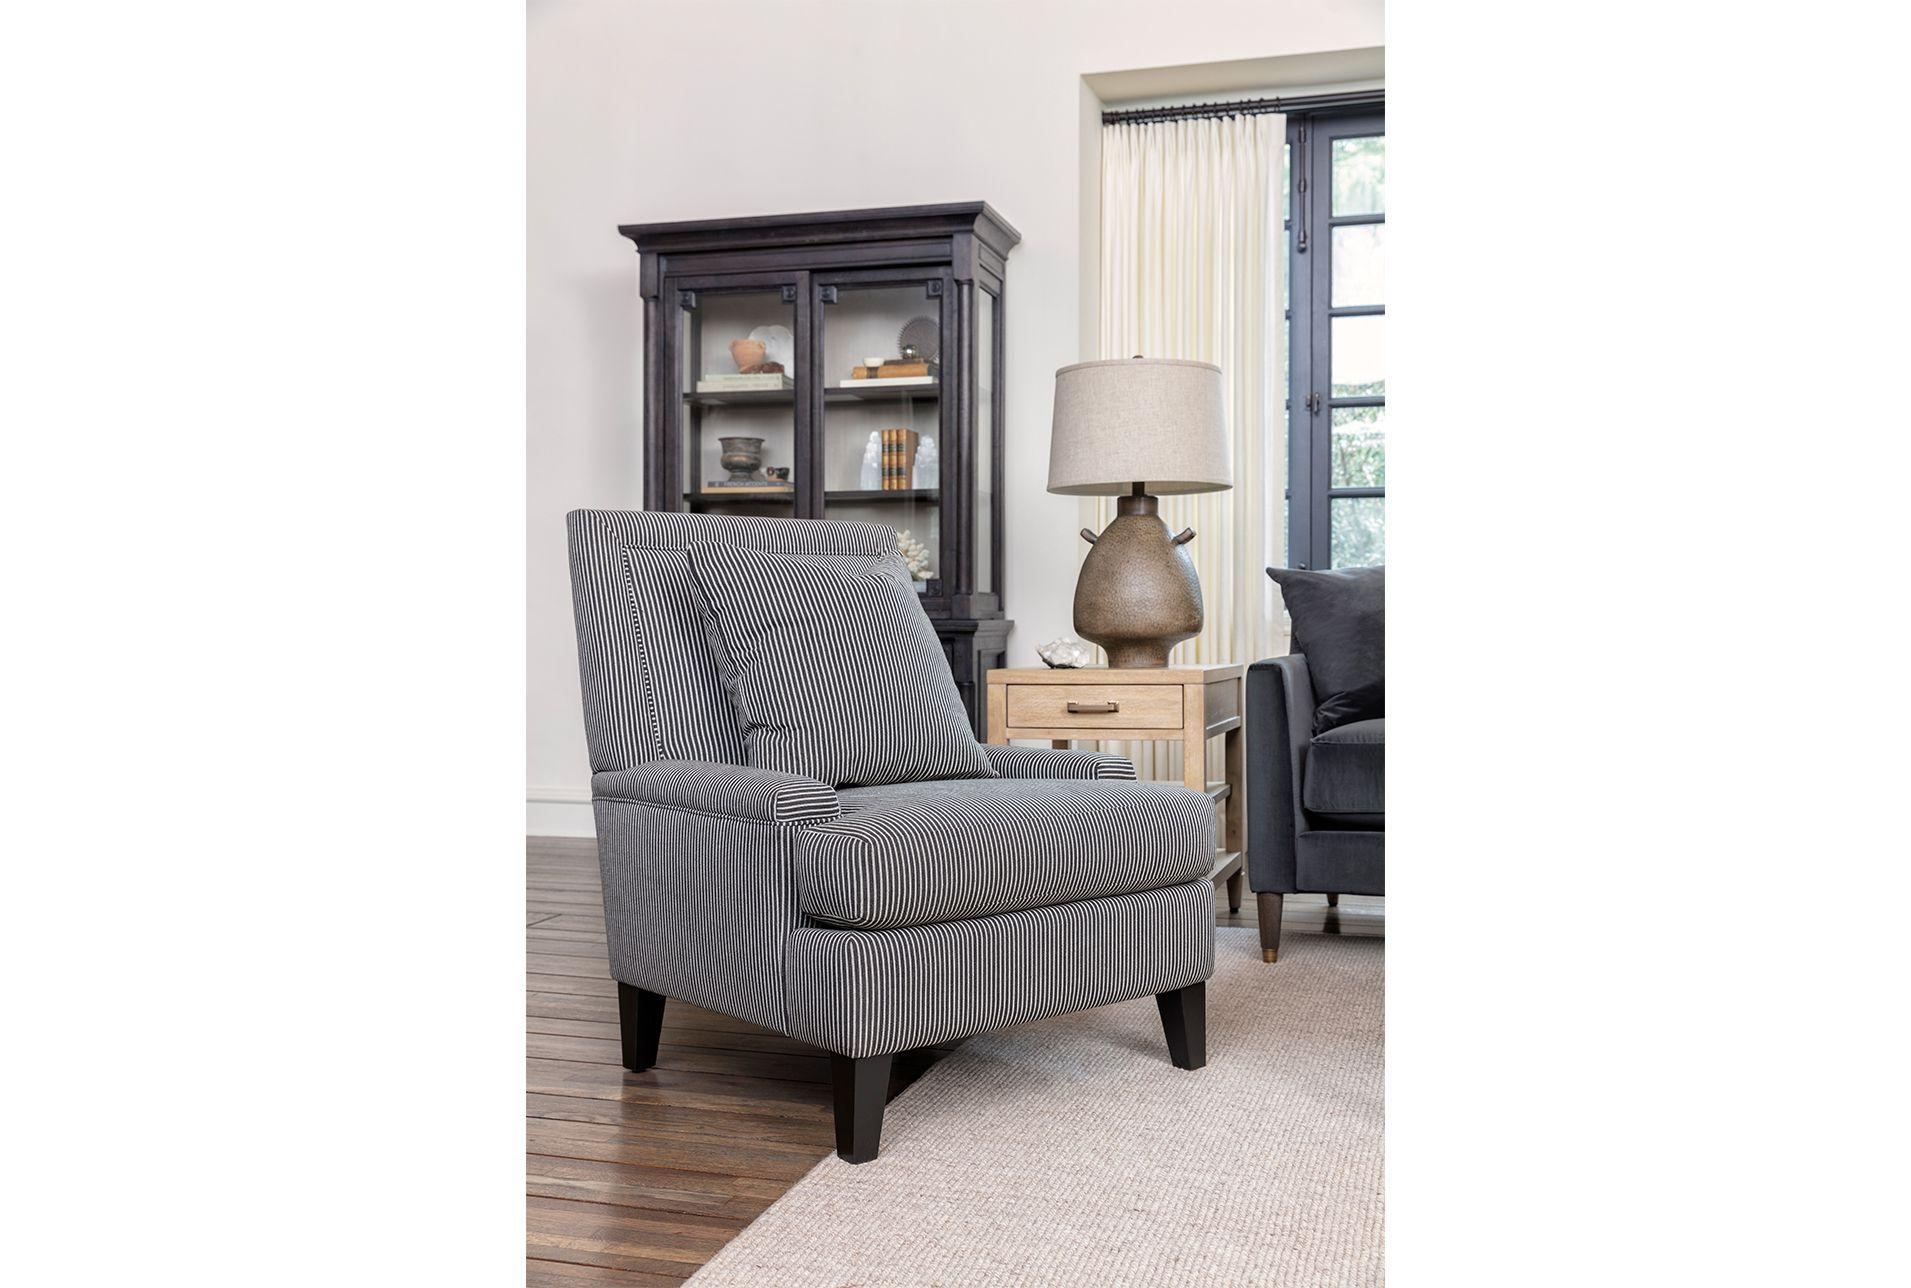 Pleasing Laurel Jet Accent Chair By Nate Berkus And Jeremiah Brent In Lamtechconsult Wood Chair Design Ideas Lamtechconsultcom